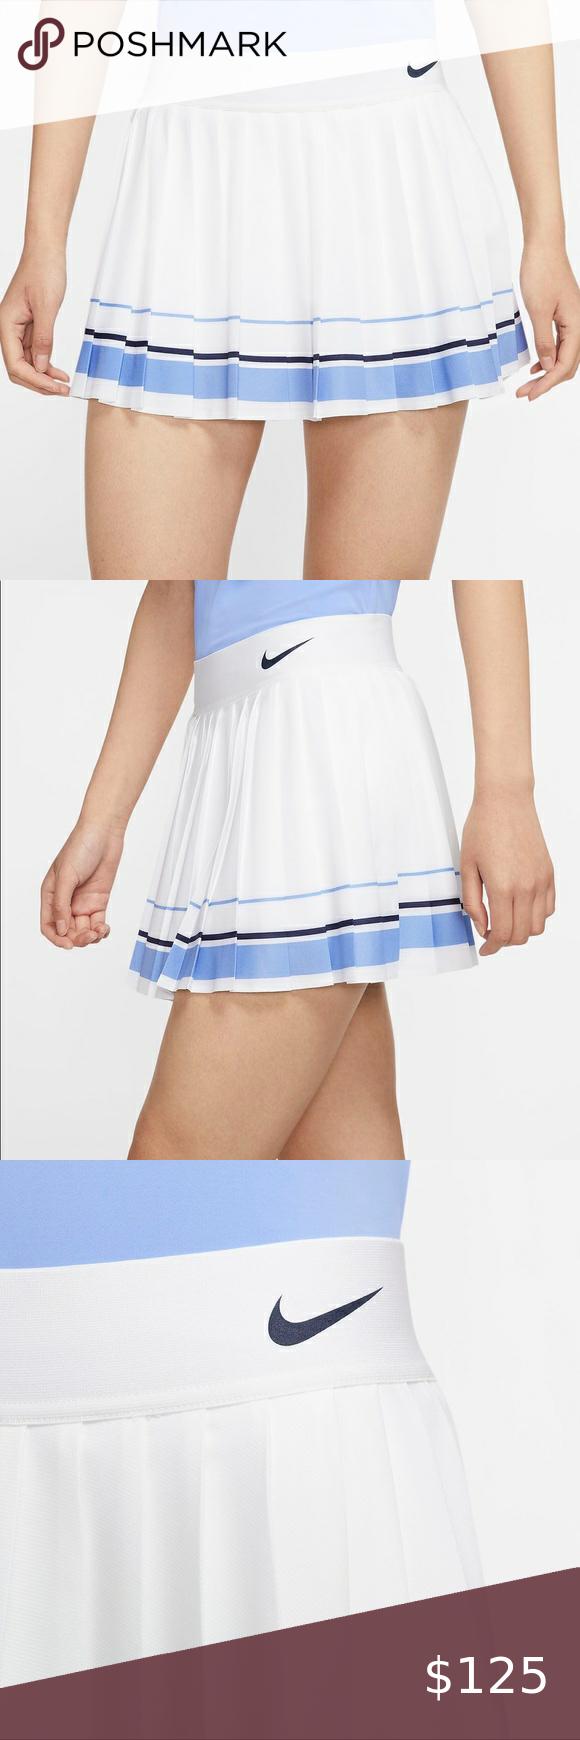 Nike X Maria Sharapova Pleated Tennis Skirt Sz M Nwt Nike X Maria Sharapova Pleated Tennis Skirt Size M In 2020 Pleated Tennis Skirt Tennis Skirt Nike Skirts